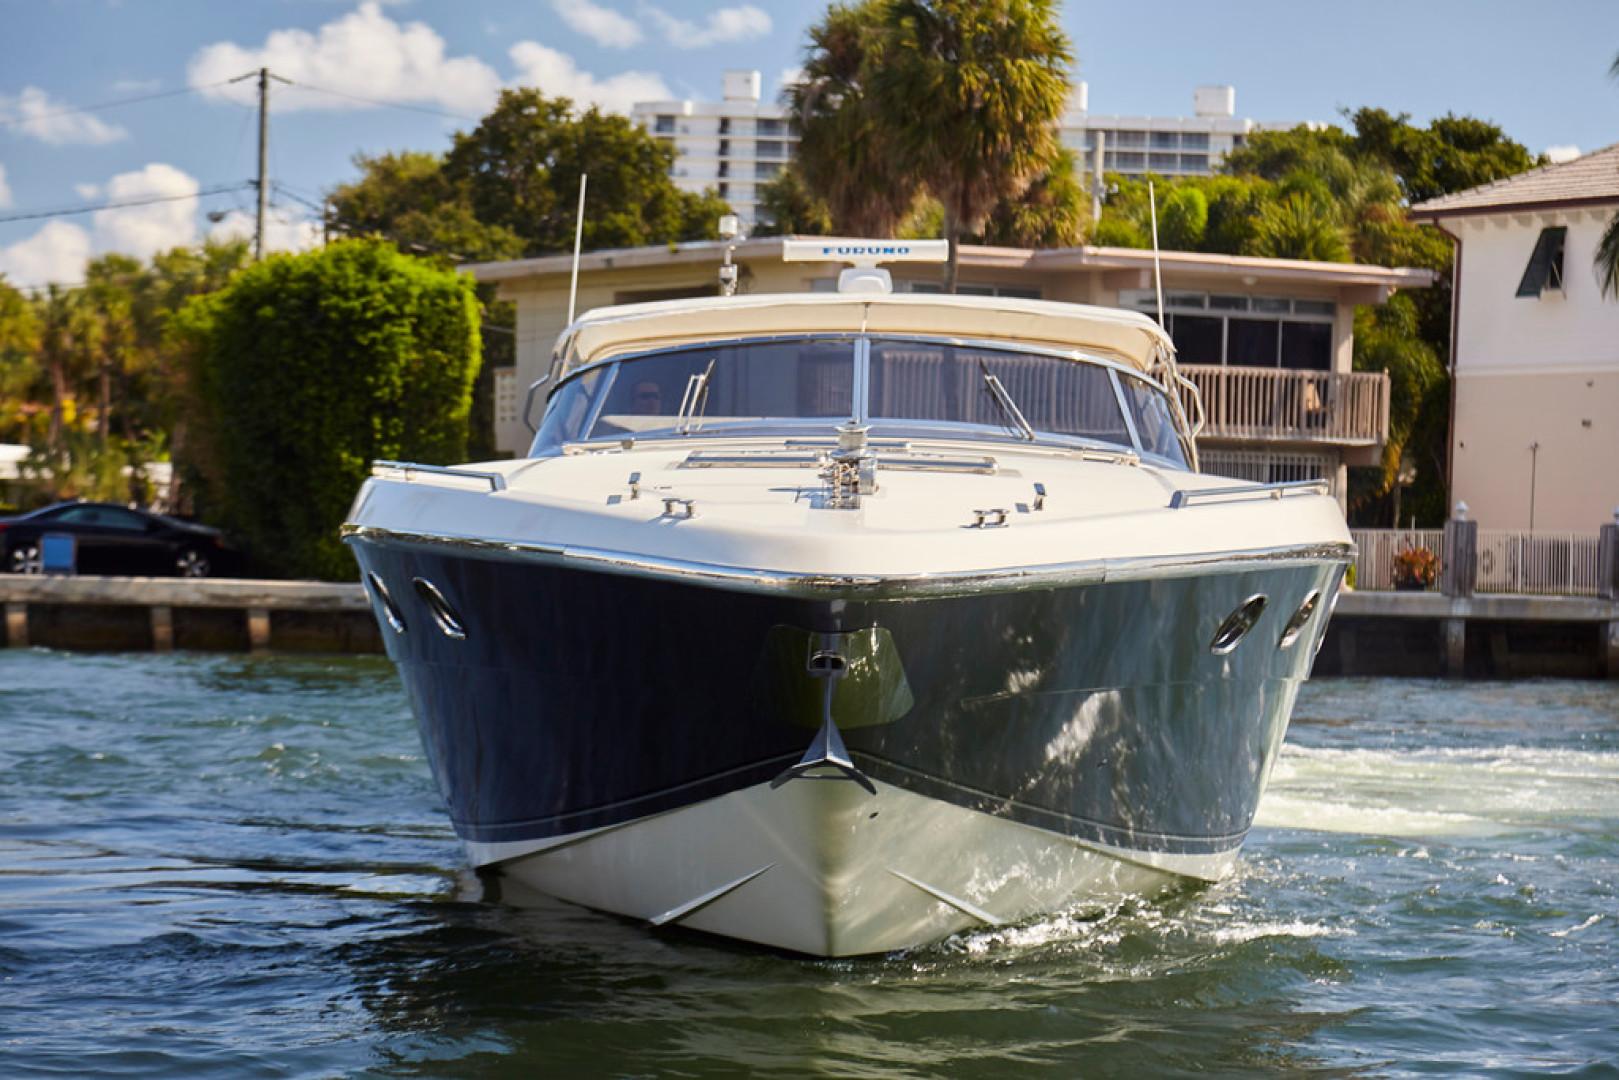 Baia-Sports Cruiser 1998 -Fort Lauderdale-Florida-United States-1275573 | Thumbnail